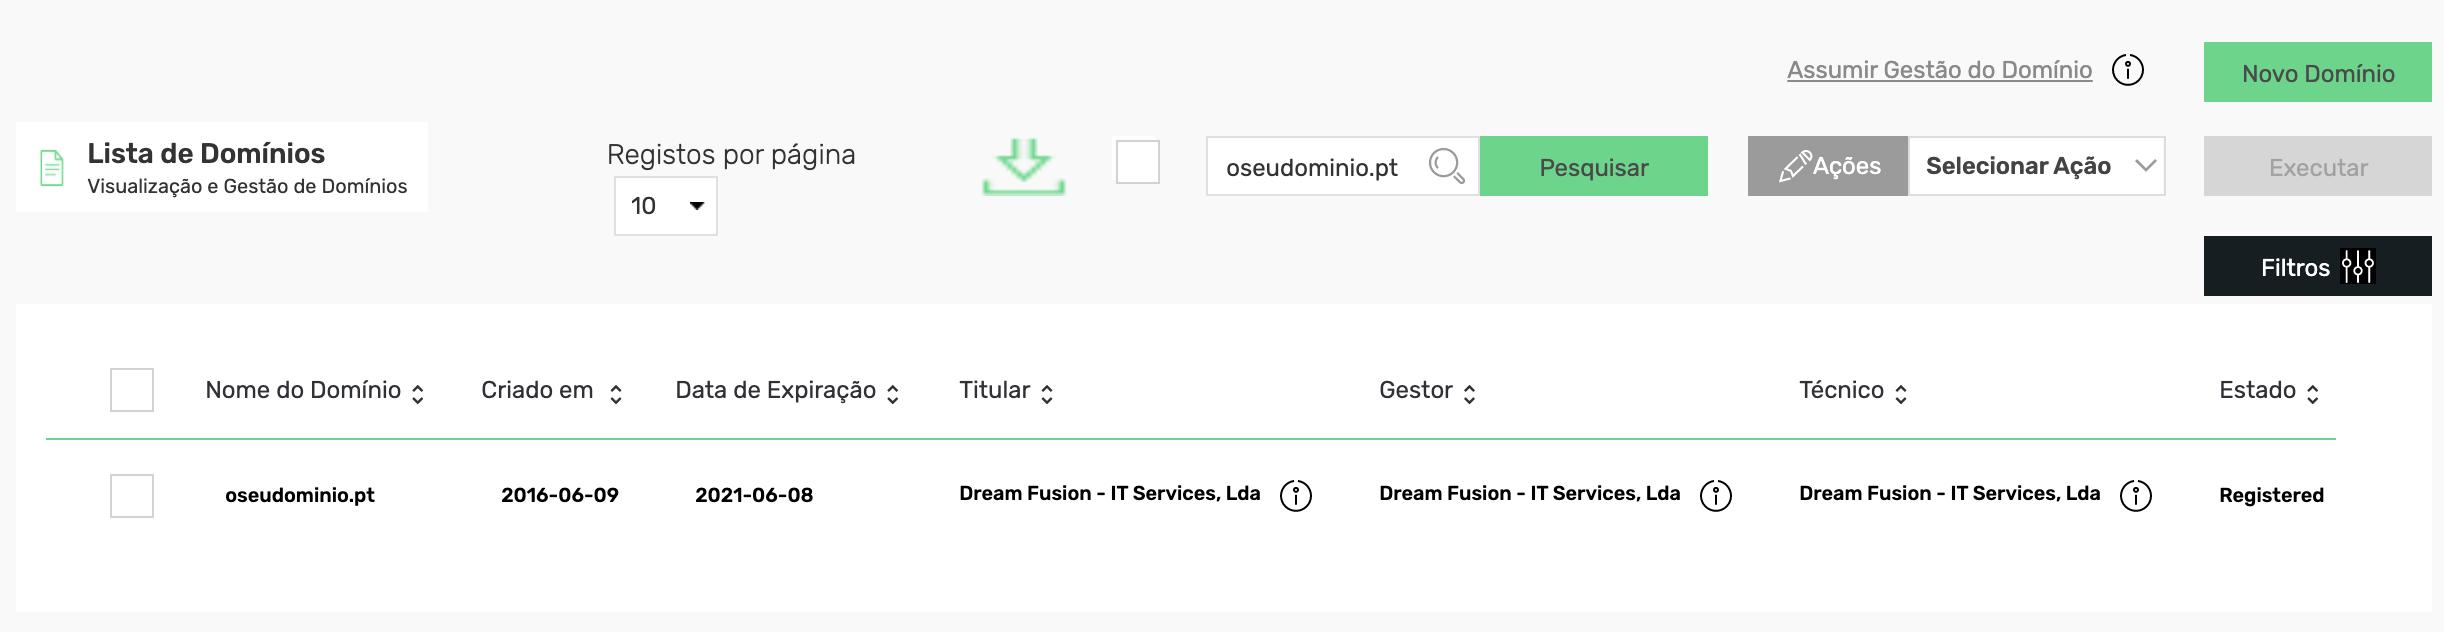 dnspt-transferir-dominios-pt-lista.png